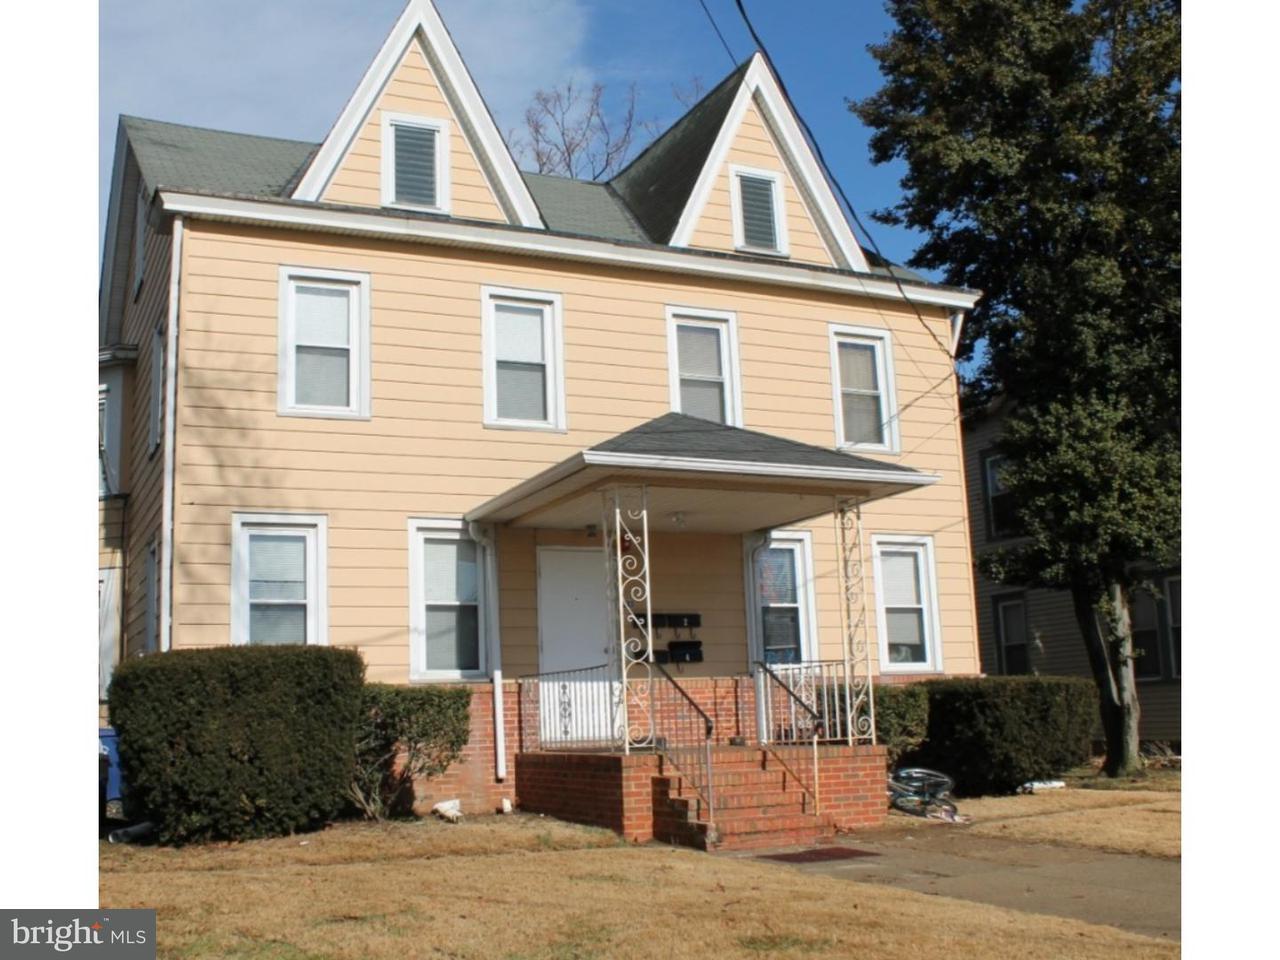 独户住宅 为 出租 在 331 W FRONT ST #4 Florence, 新泽西州 08518 美国